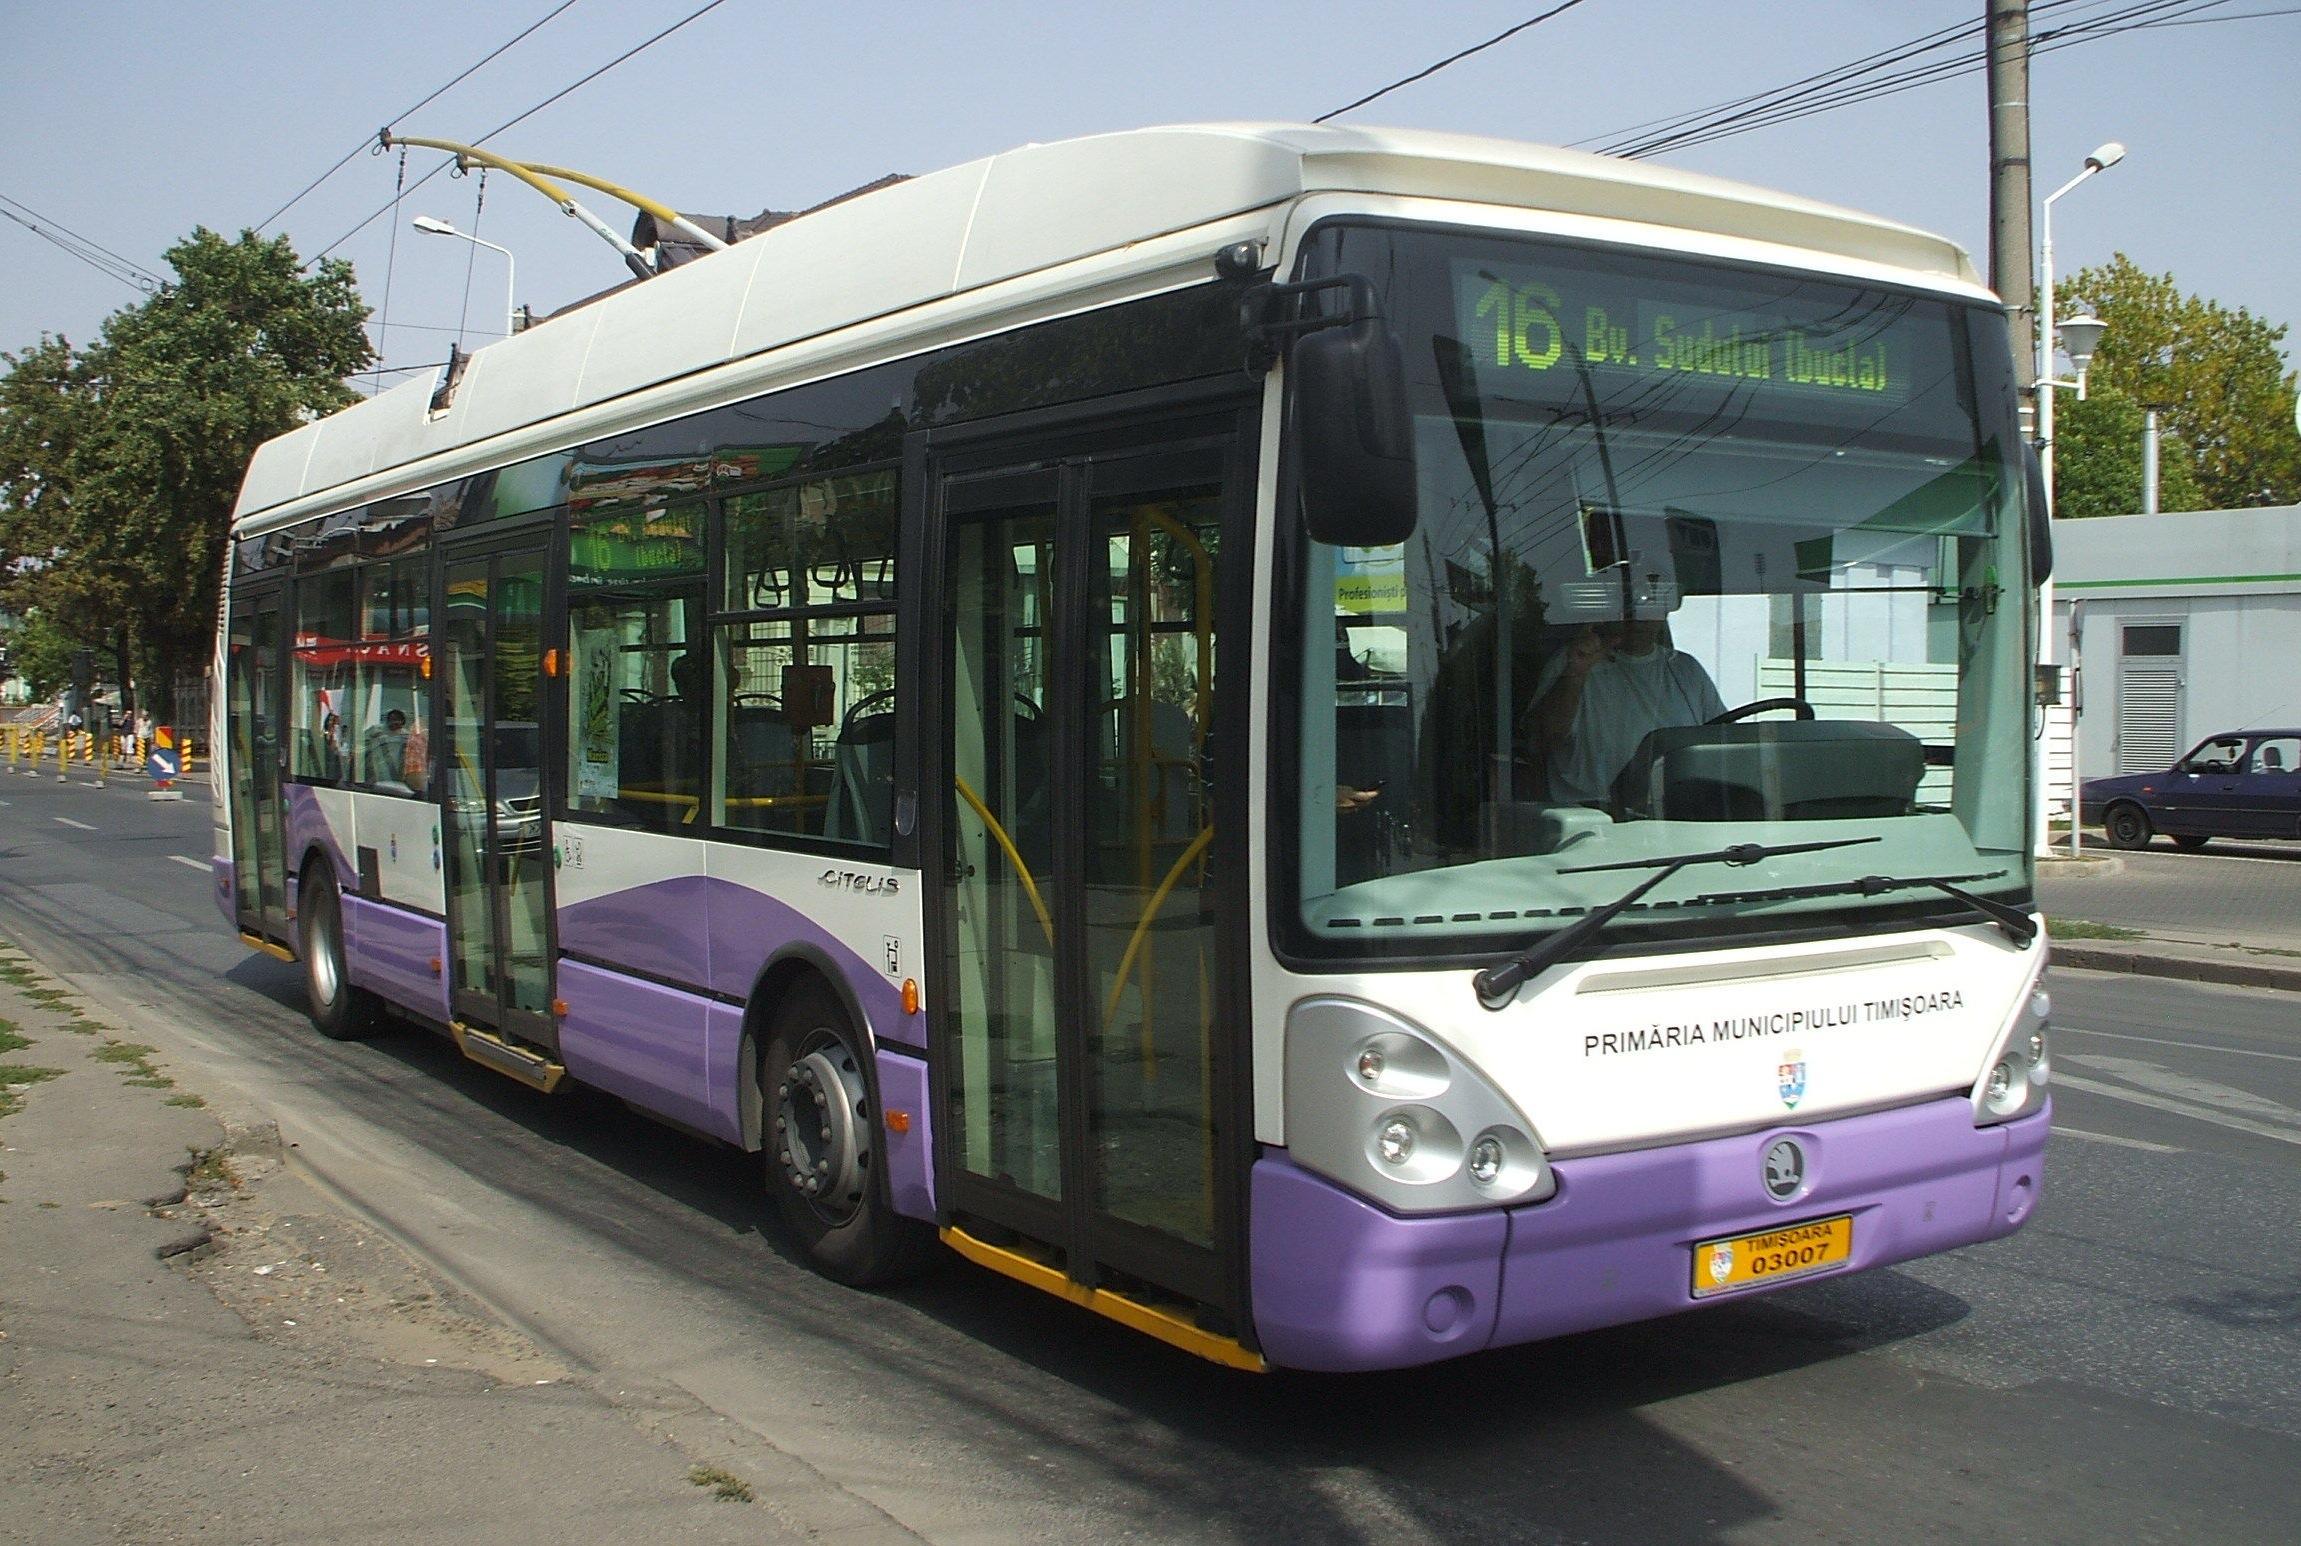 Skoda transports ... Timisoara_Skoda_trolleybus_3007